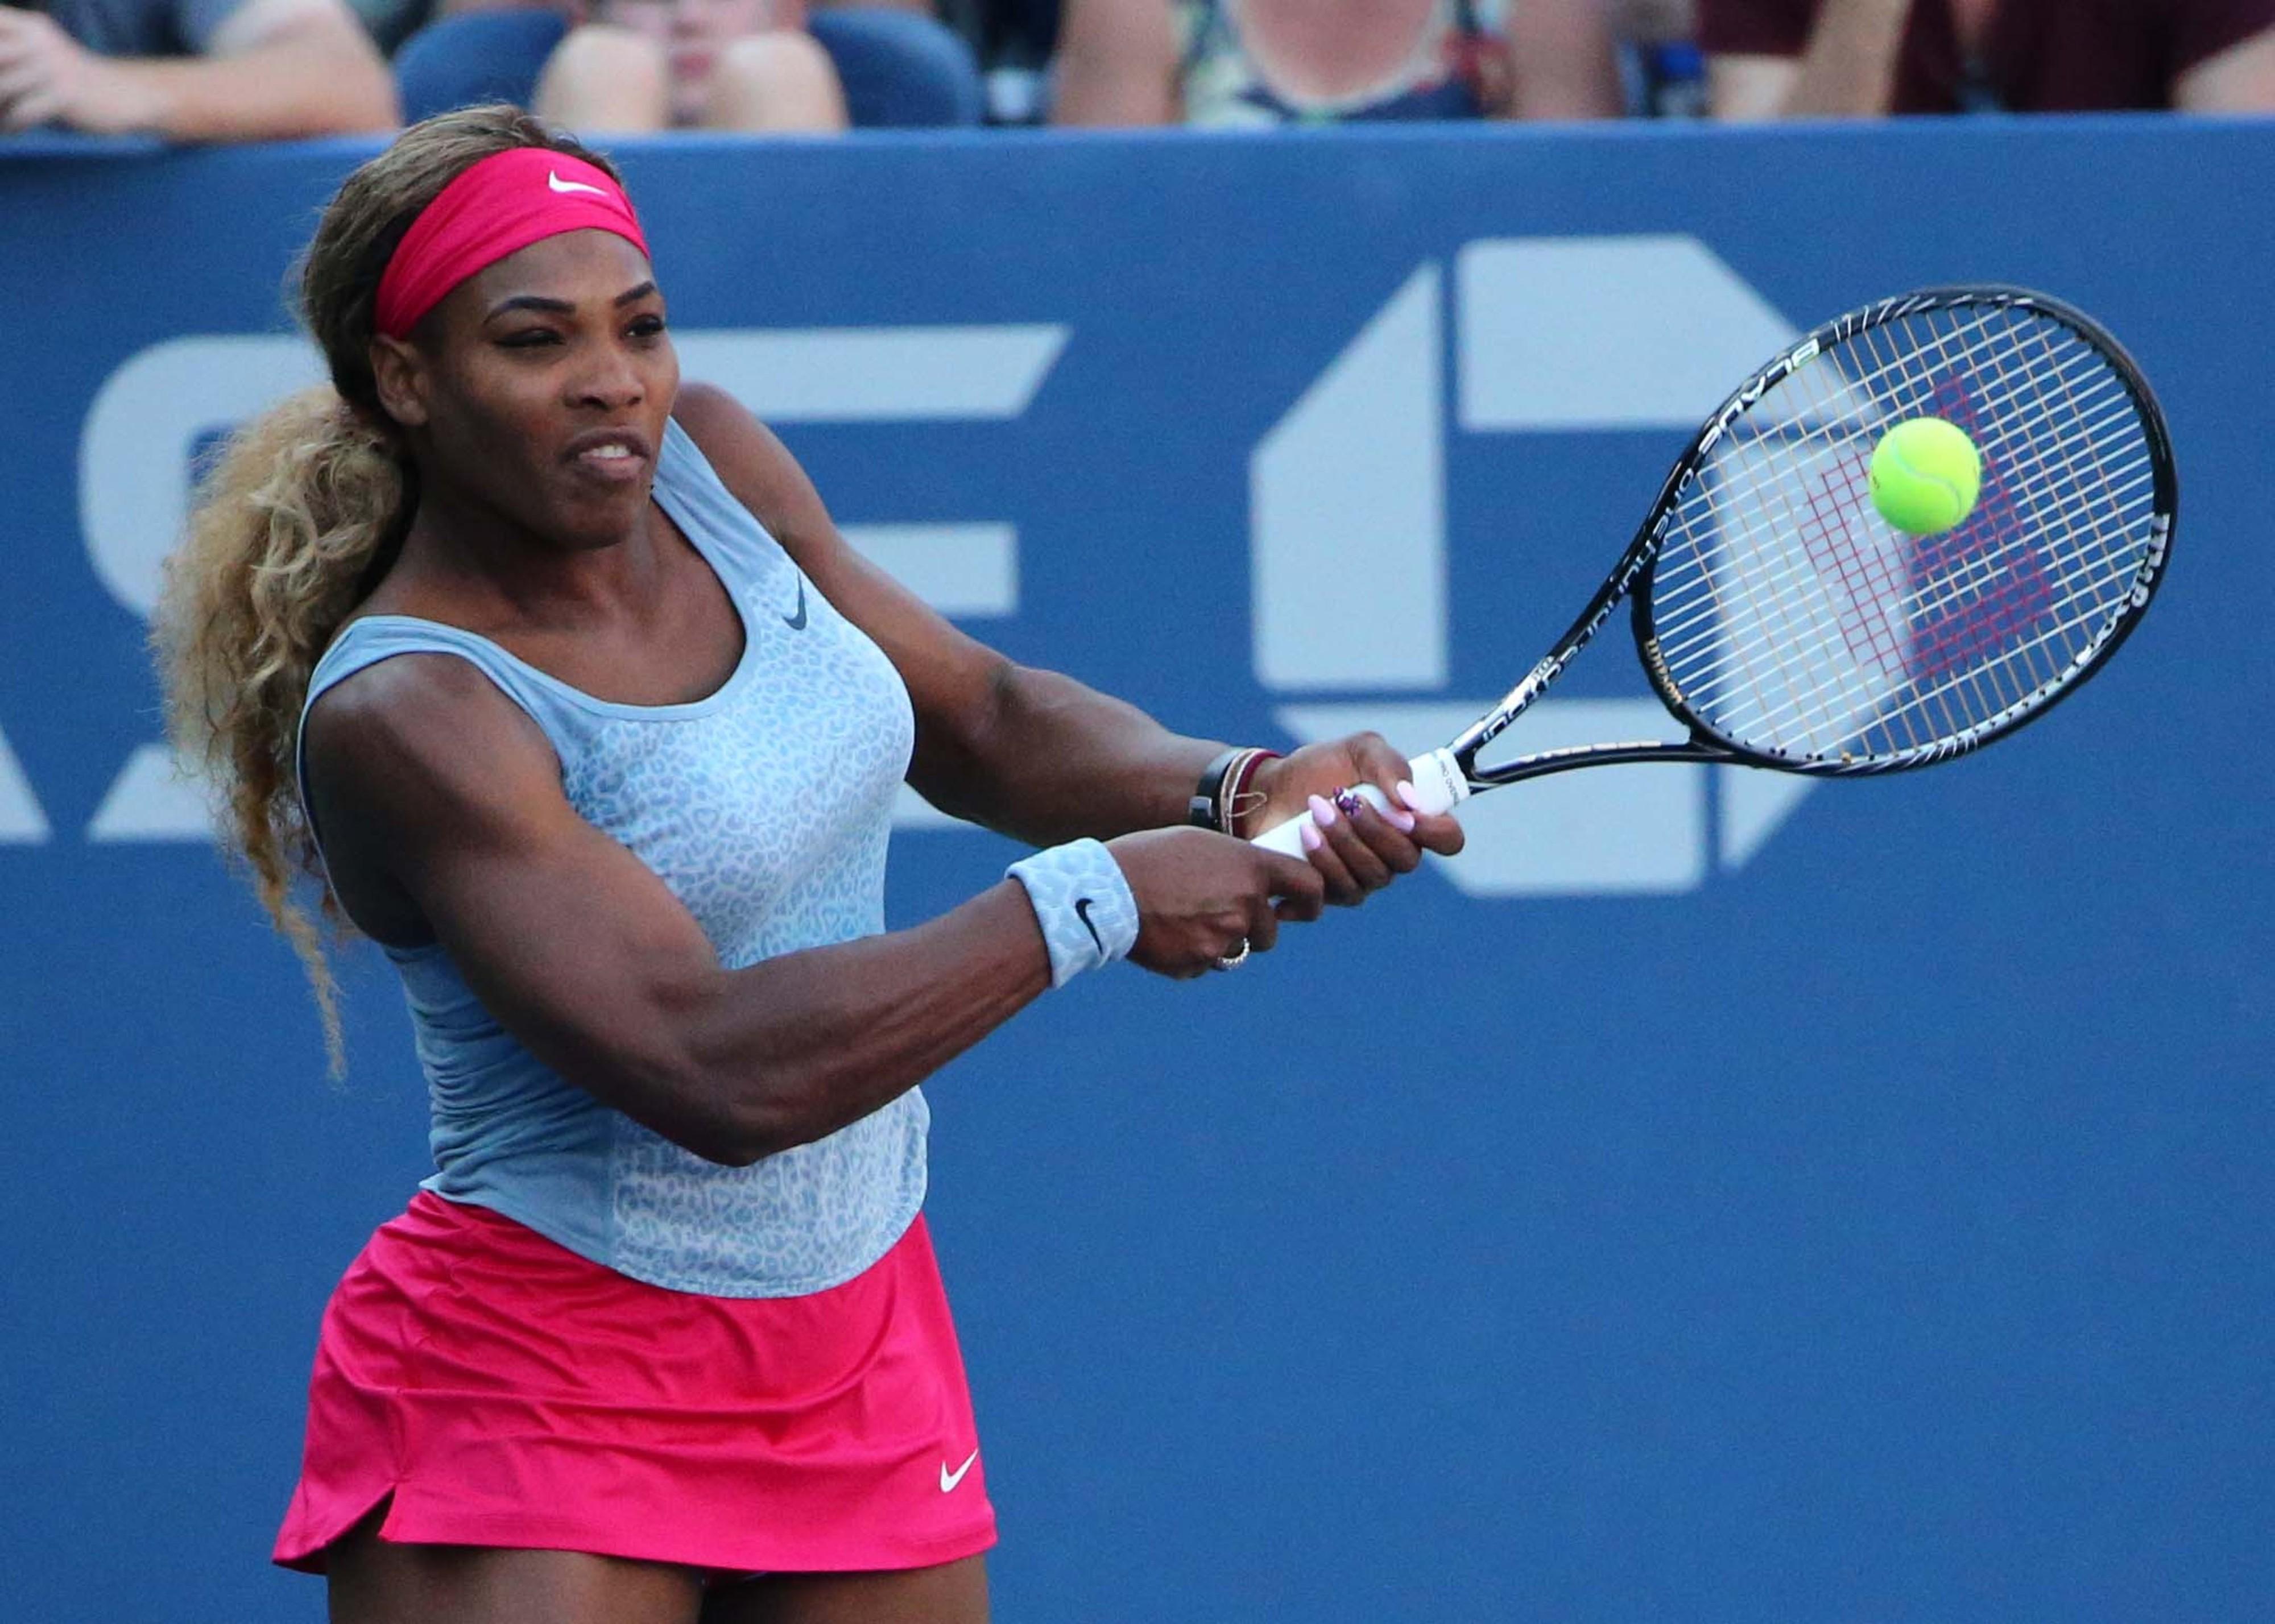 U.S. Open bracket 2014 update: Serena Williams dominates, American men down to 3